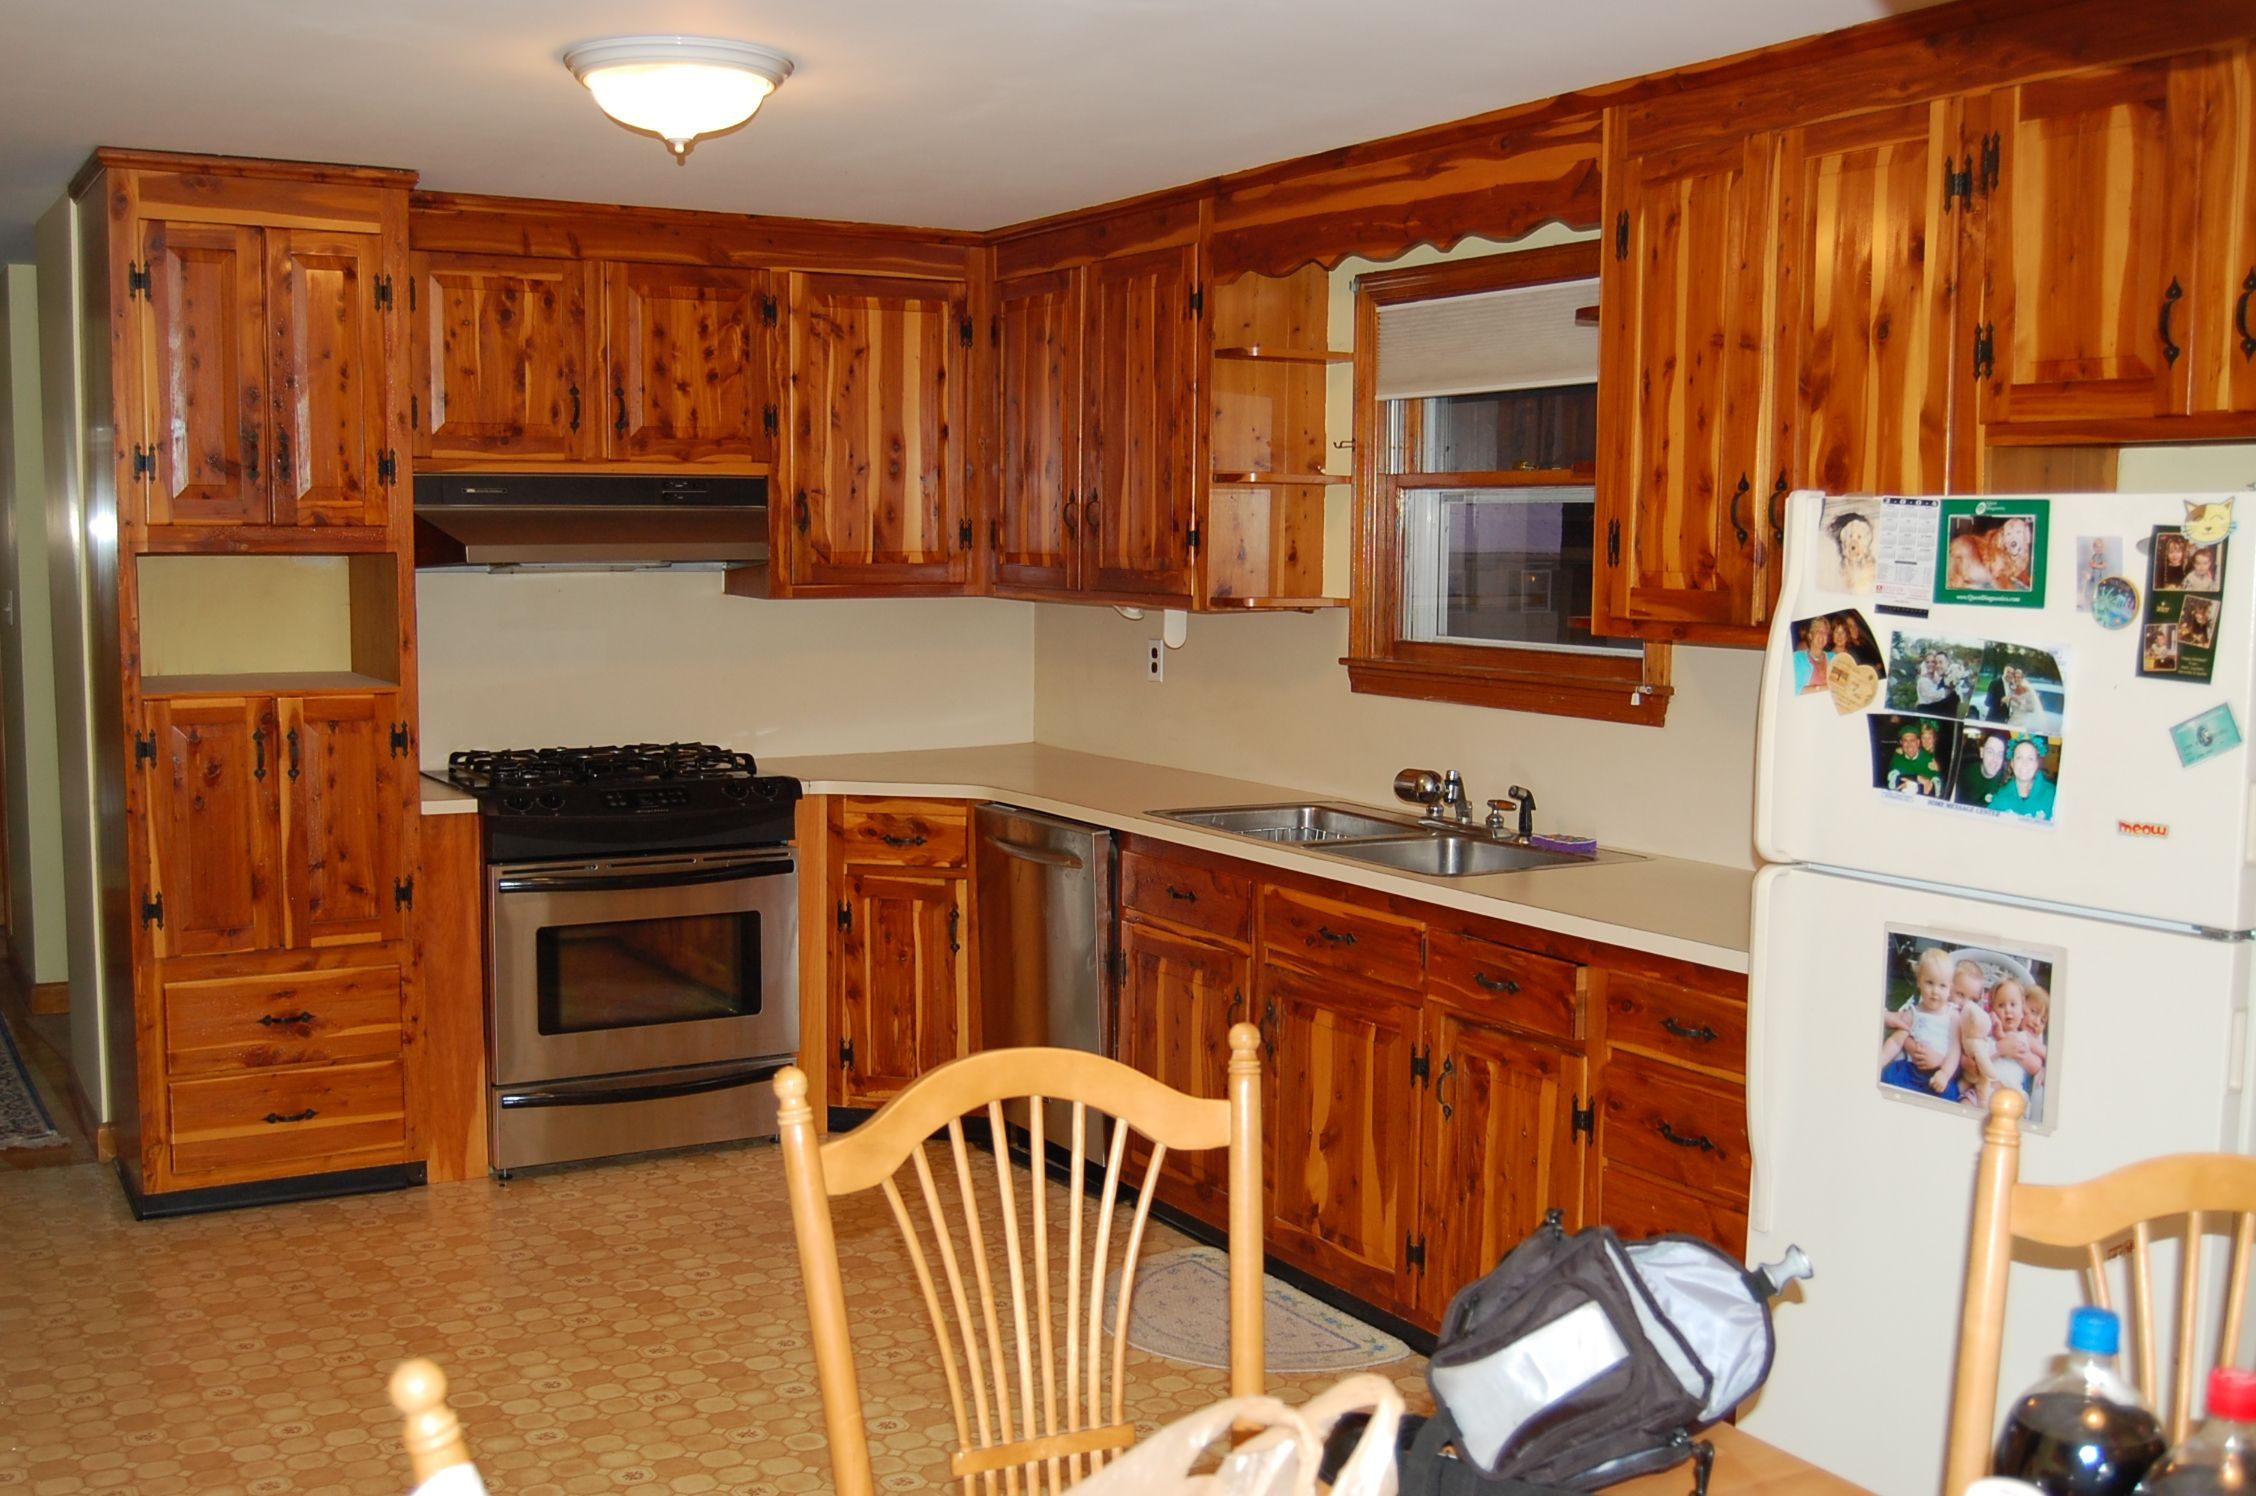 Best Description For Refacing Cabinet Doors Yourself Change The 400 x 300